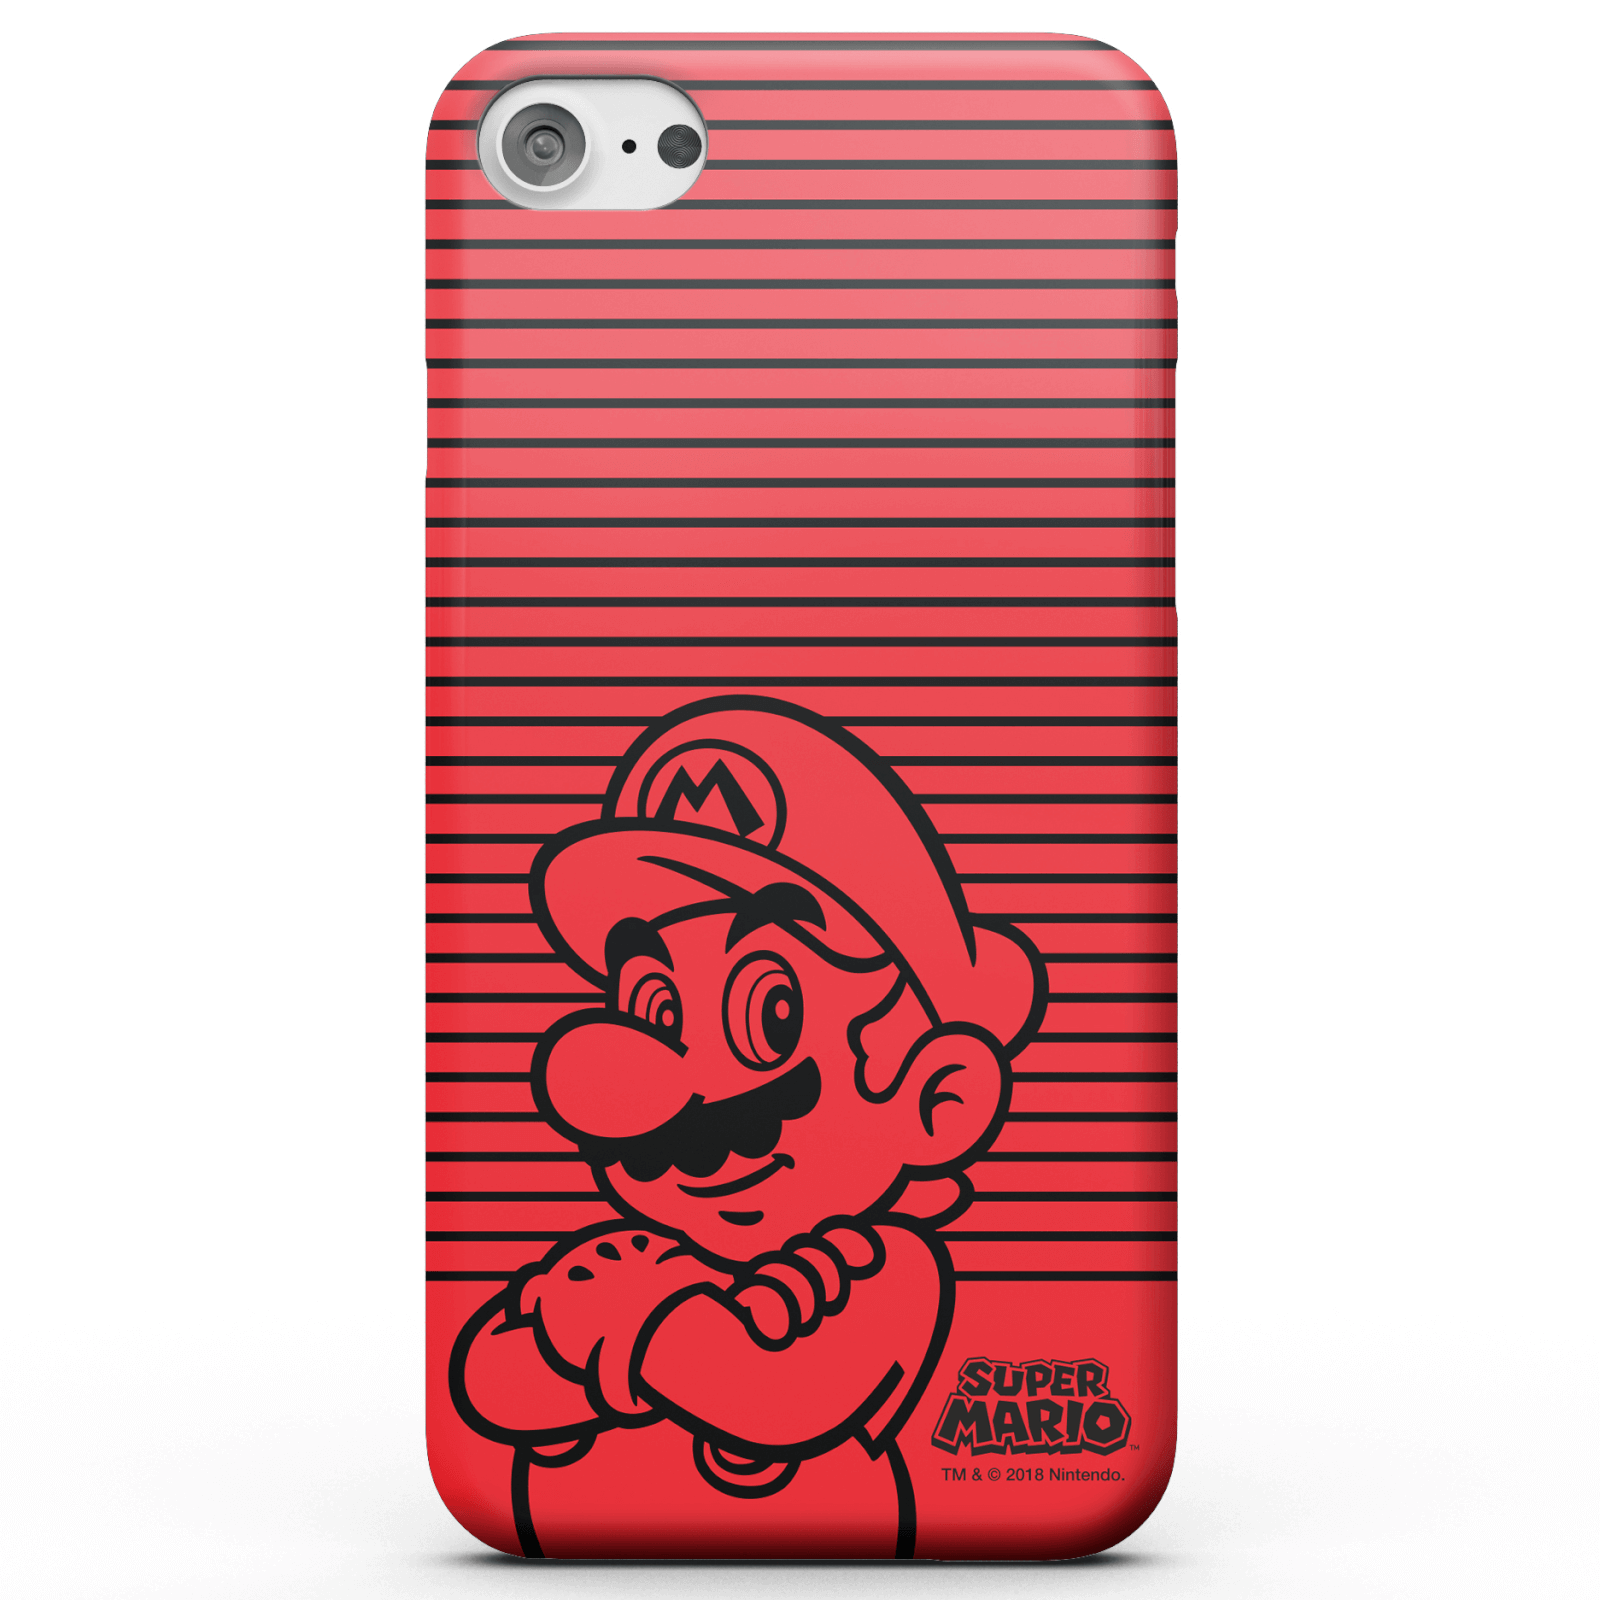 Nintendo Super Mario Mario Retro Colour Line Art Phone Case for iPhone and Android - iPhone 6 Plus - Tough Case - Gloss